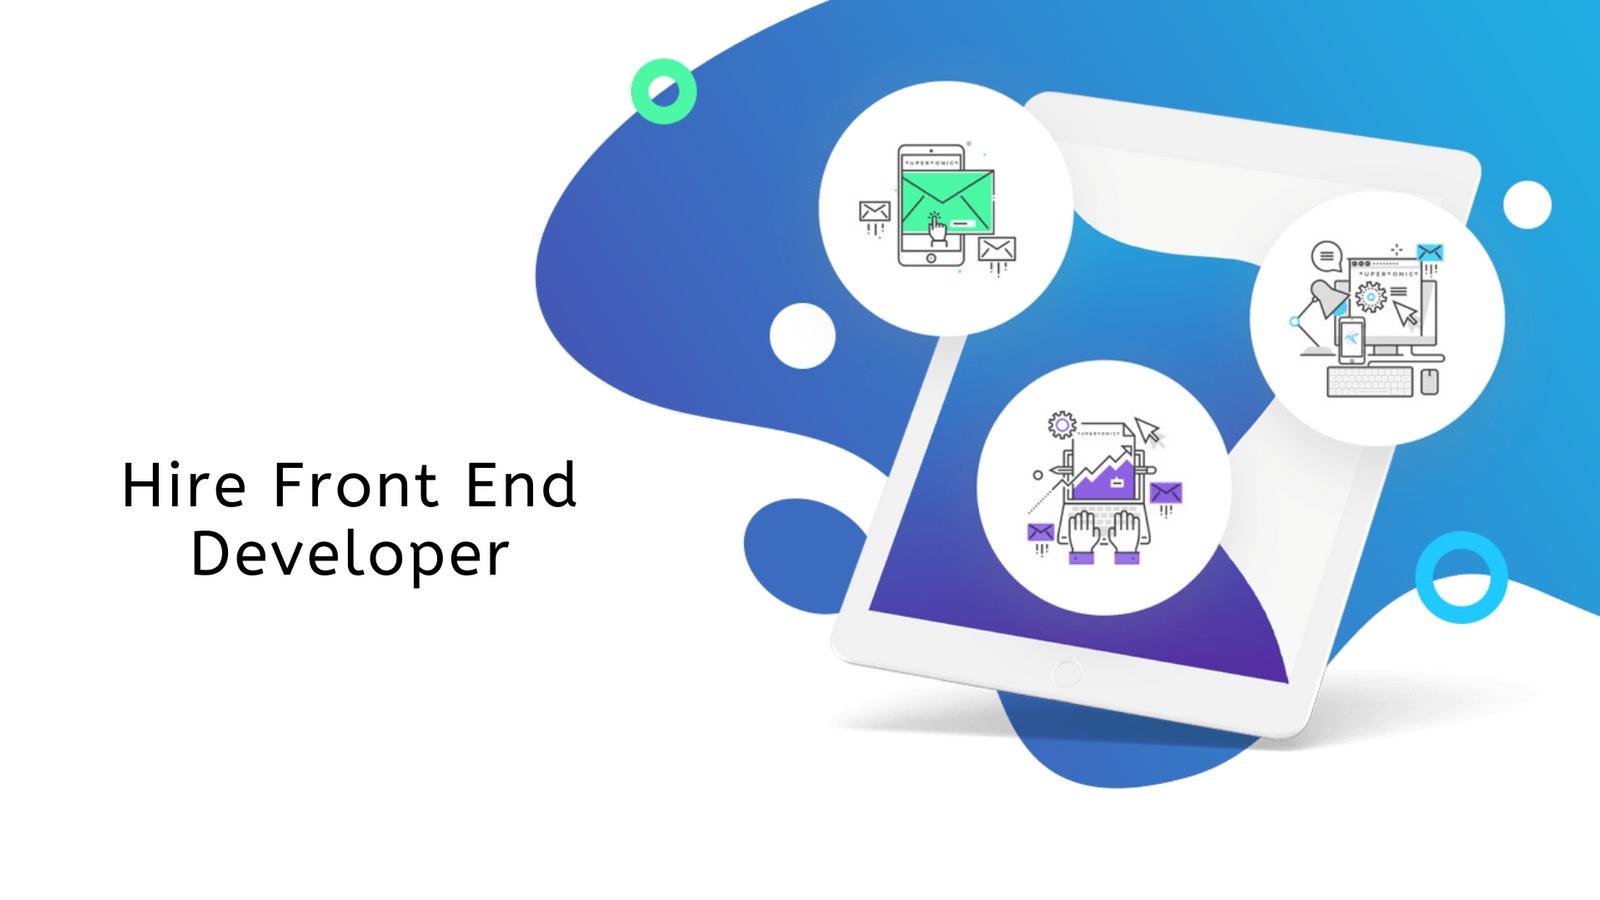 Hire Front End Developer